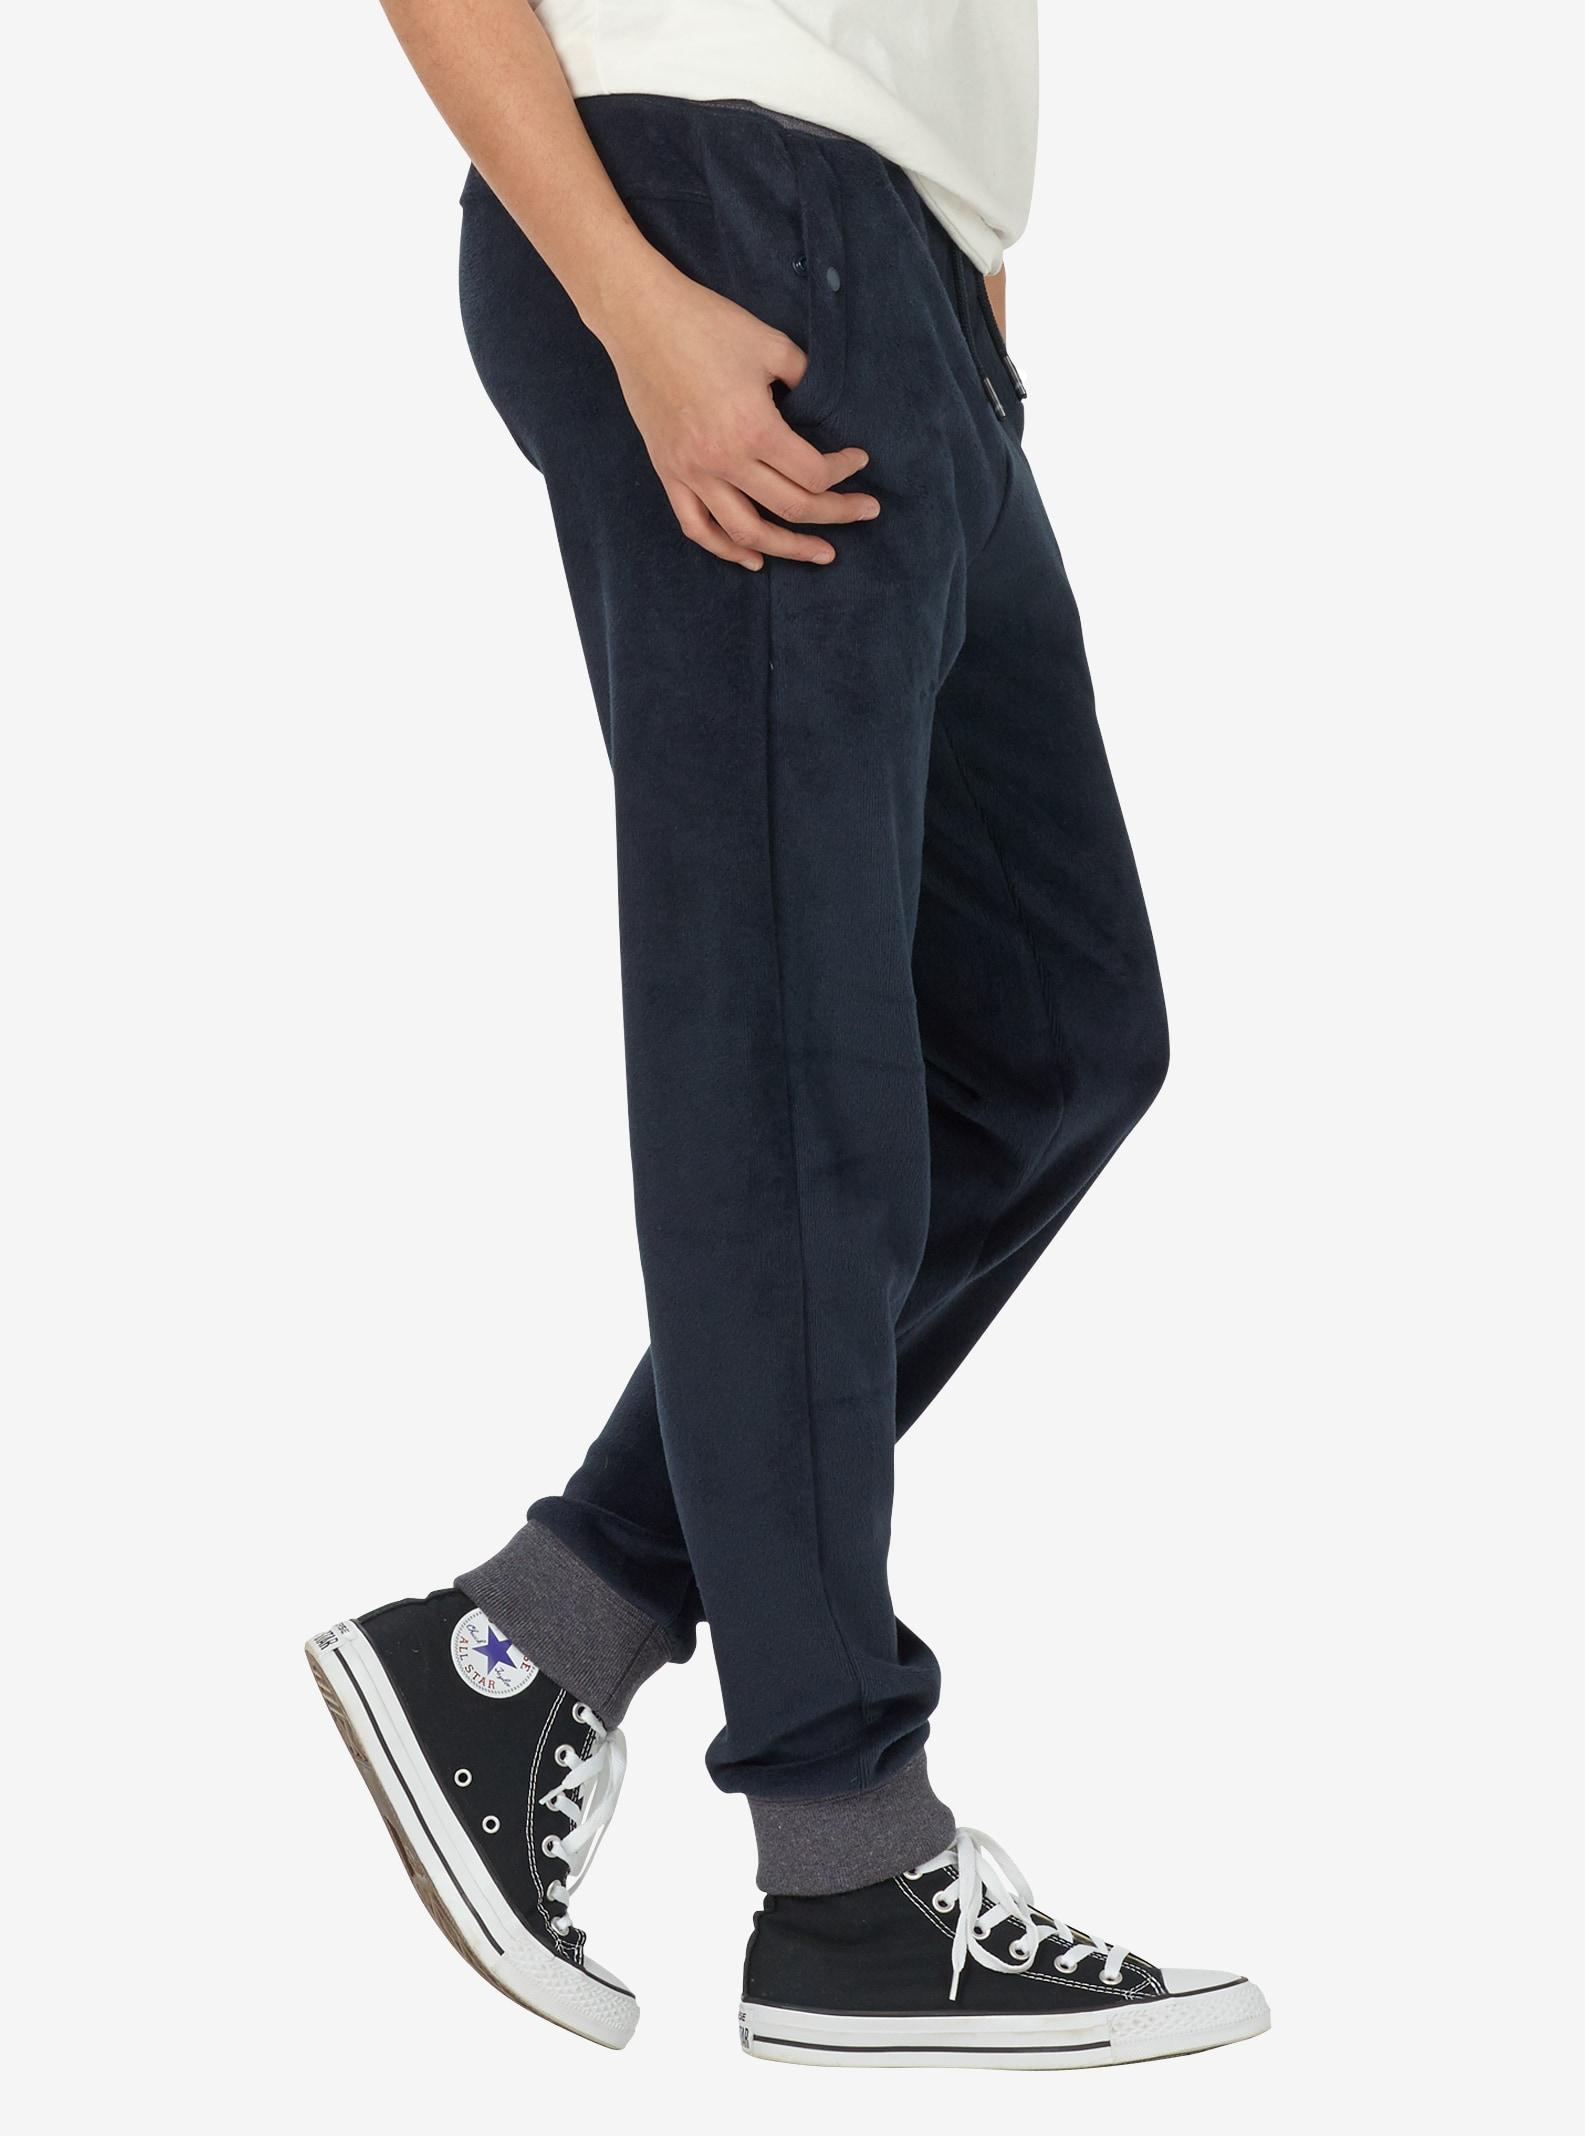 Women's Burton Rolston Fleece Pant shown in Mood Indigo Heather